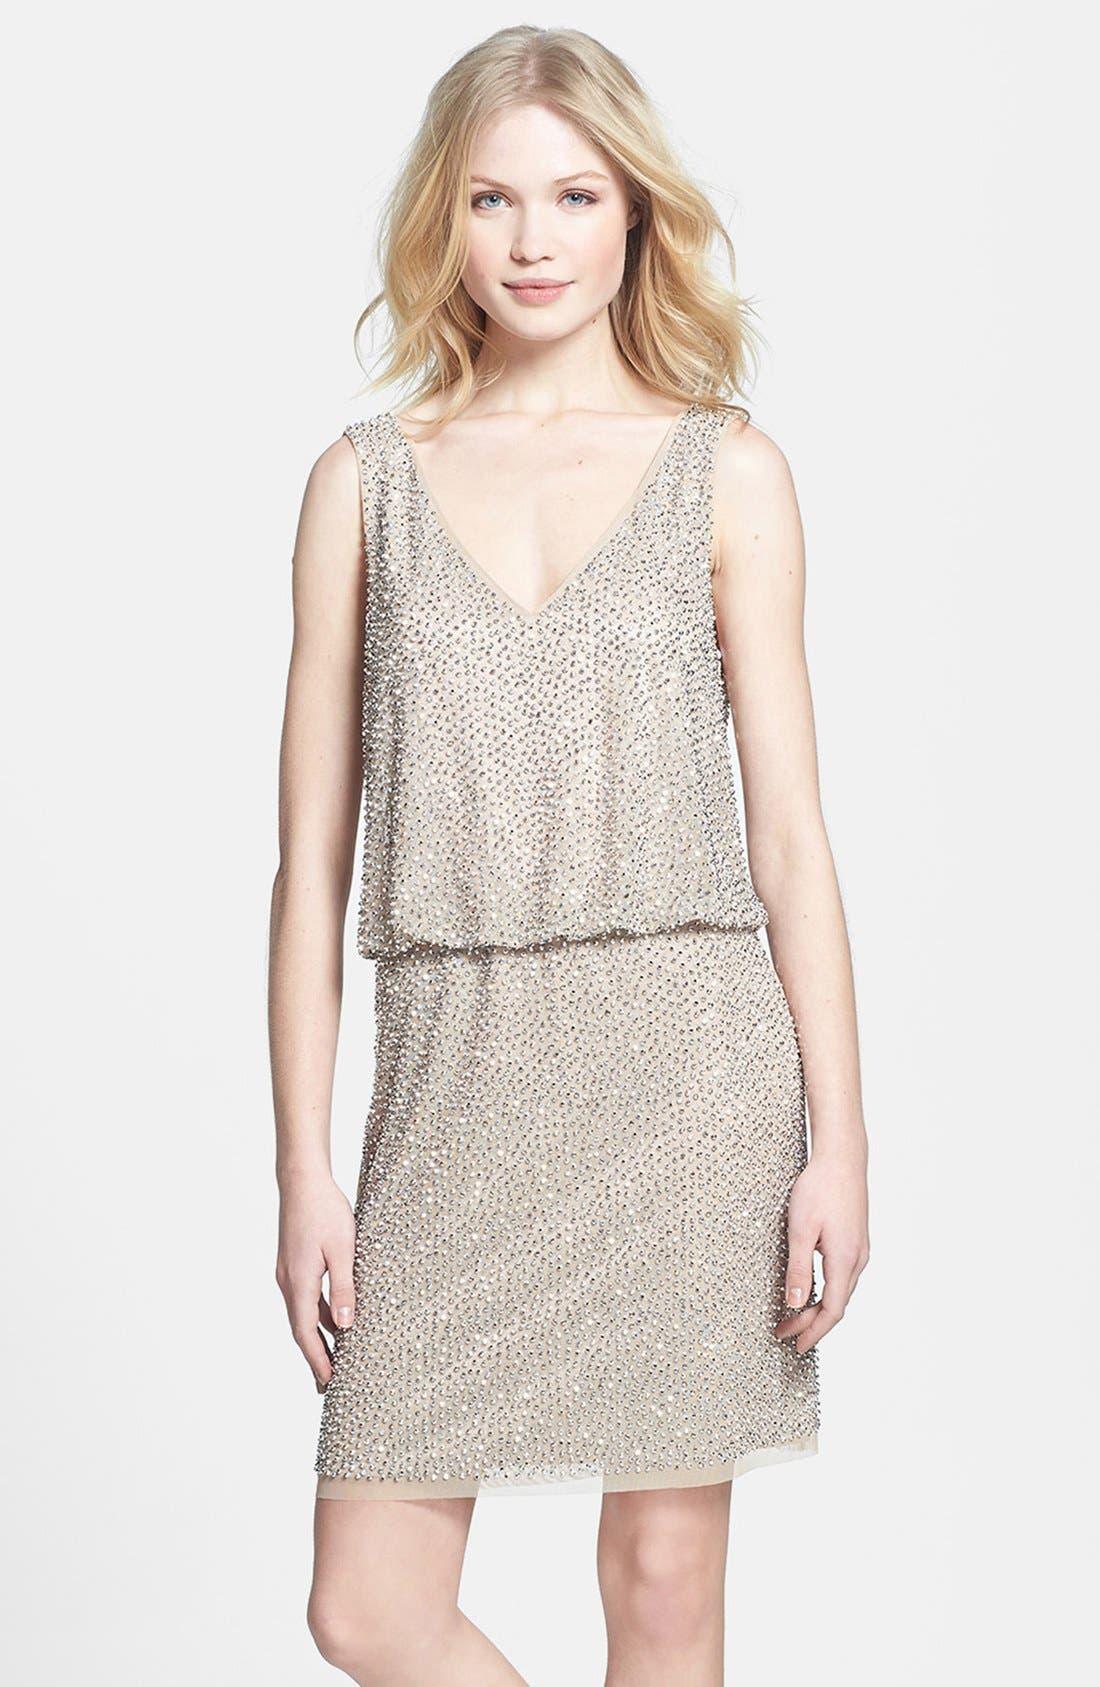 Alternate Image 1 Selected - Xscape Beaded Blouson Dress